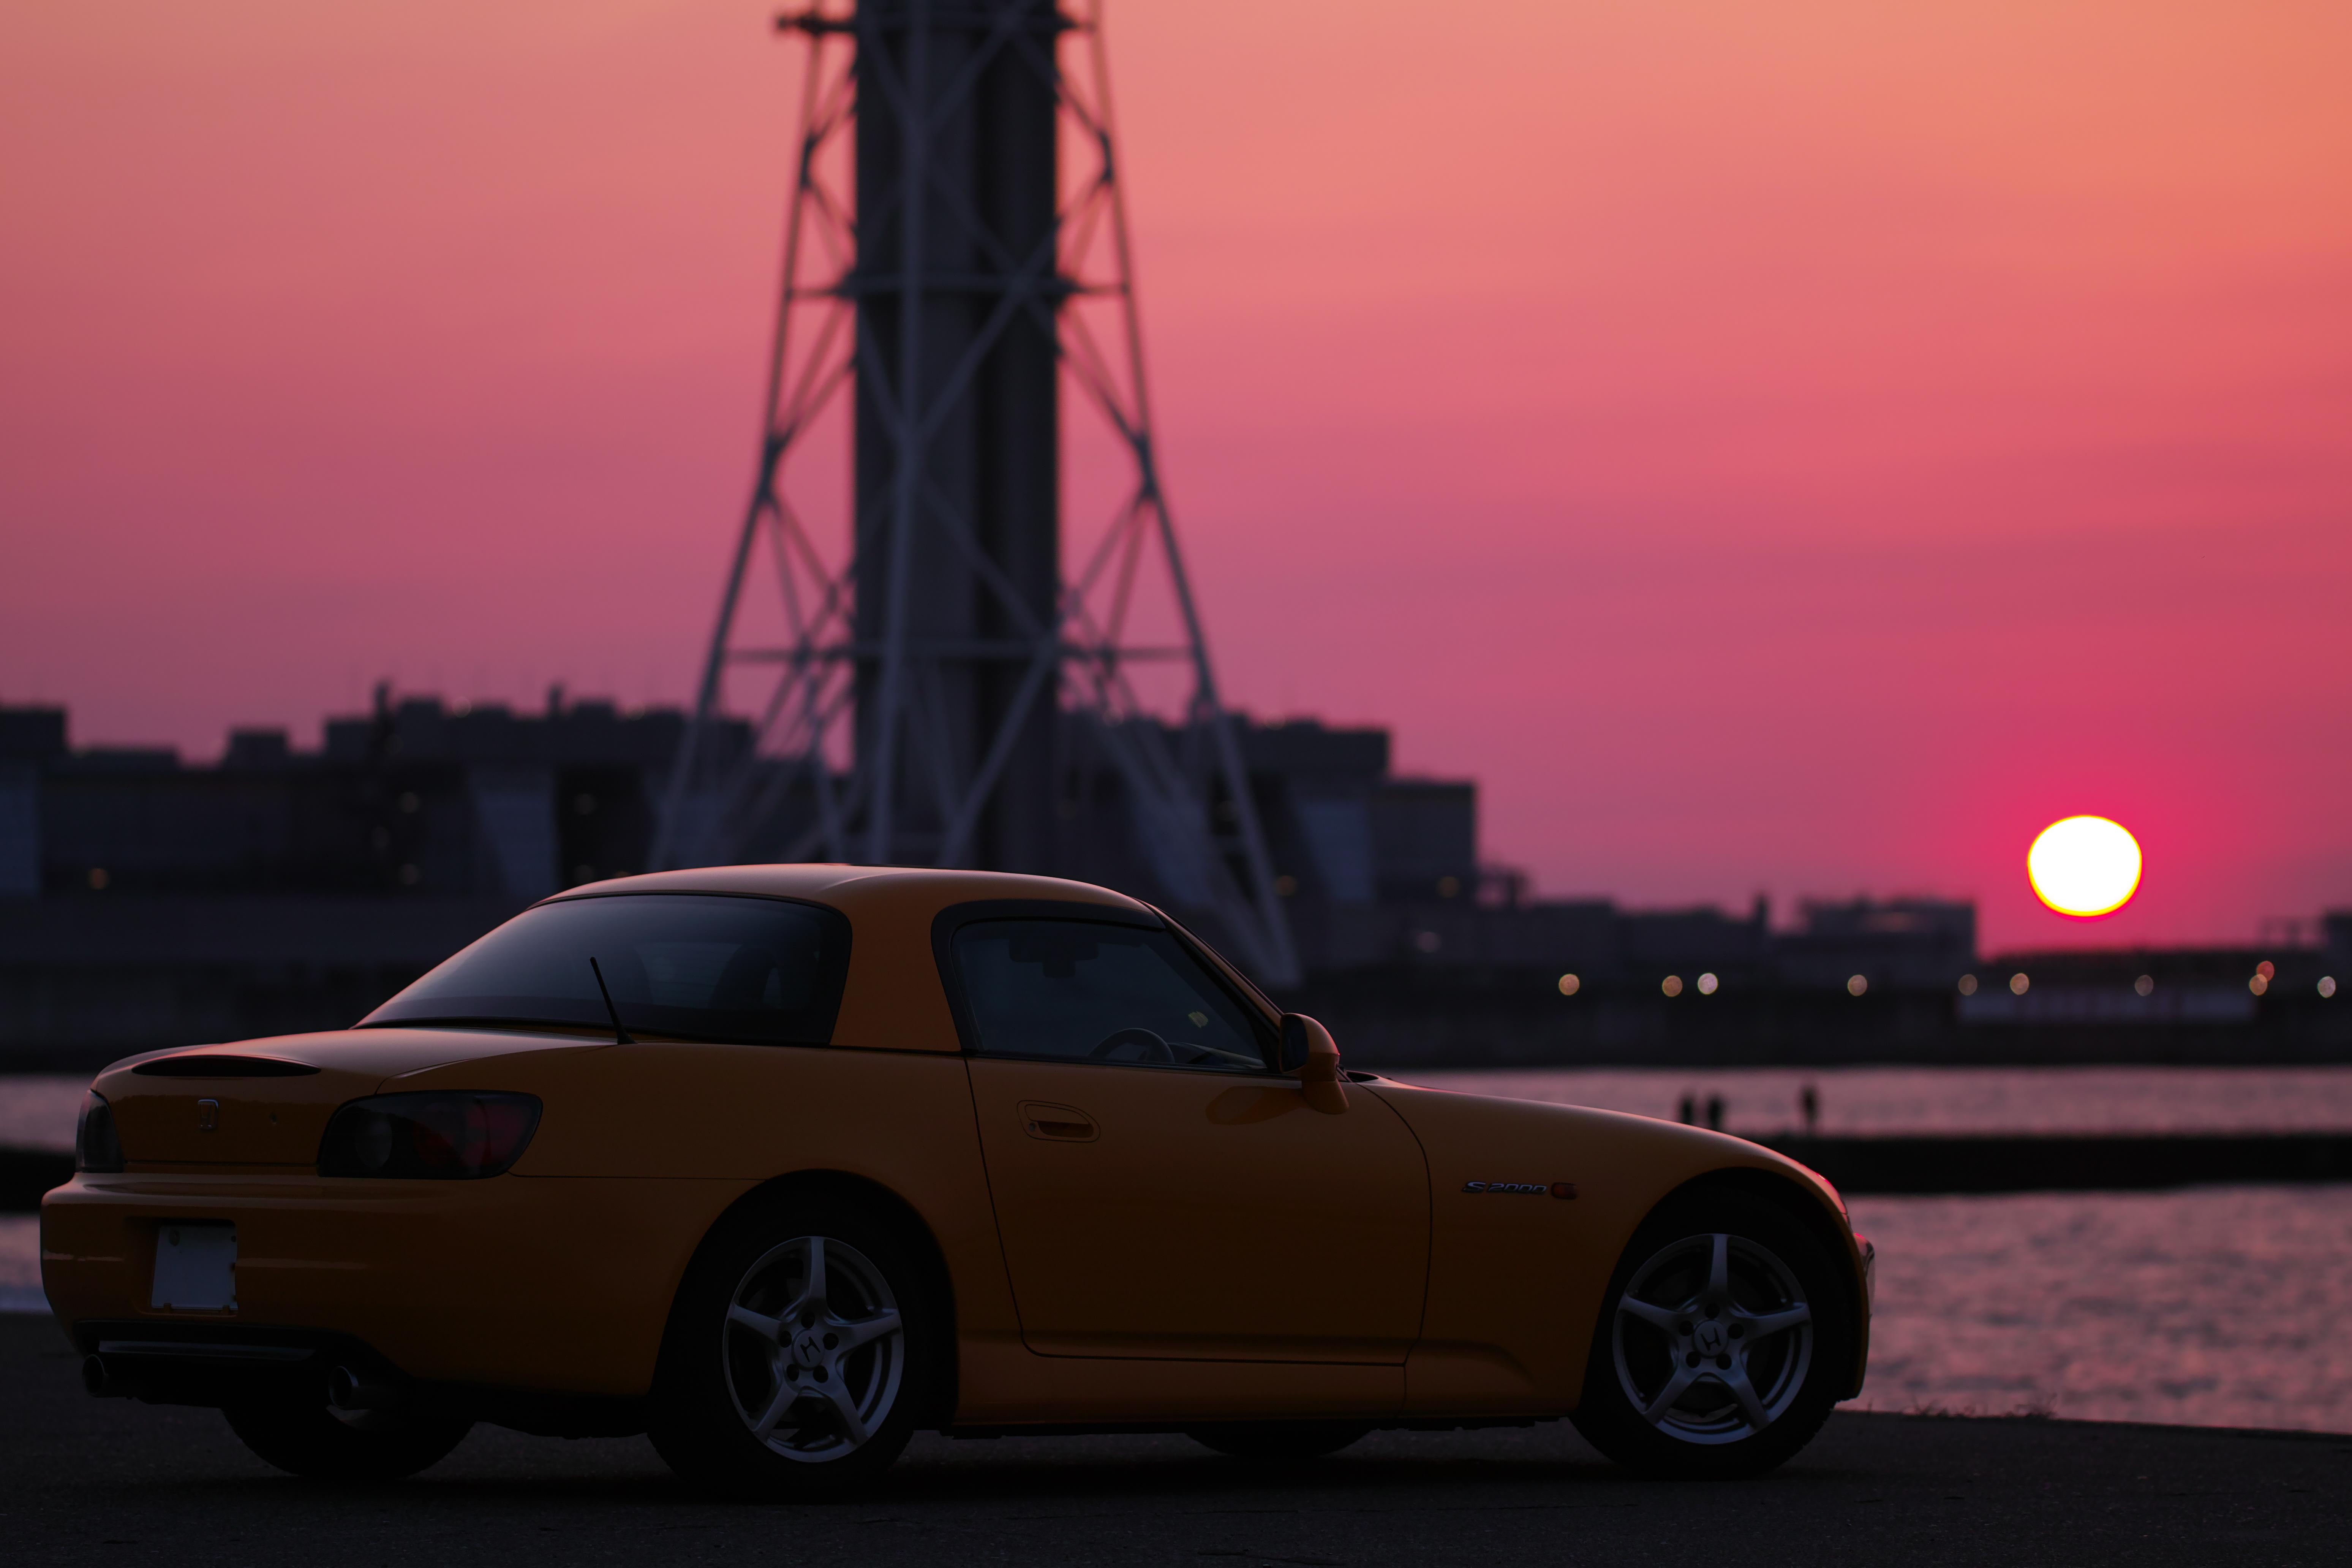 S2000 ~sunset